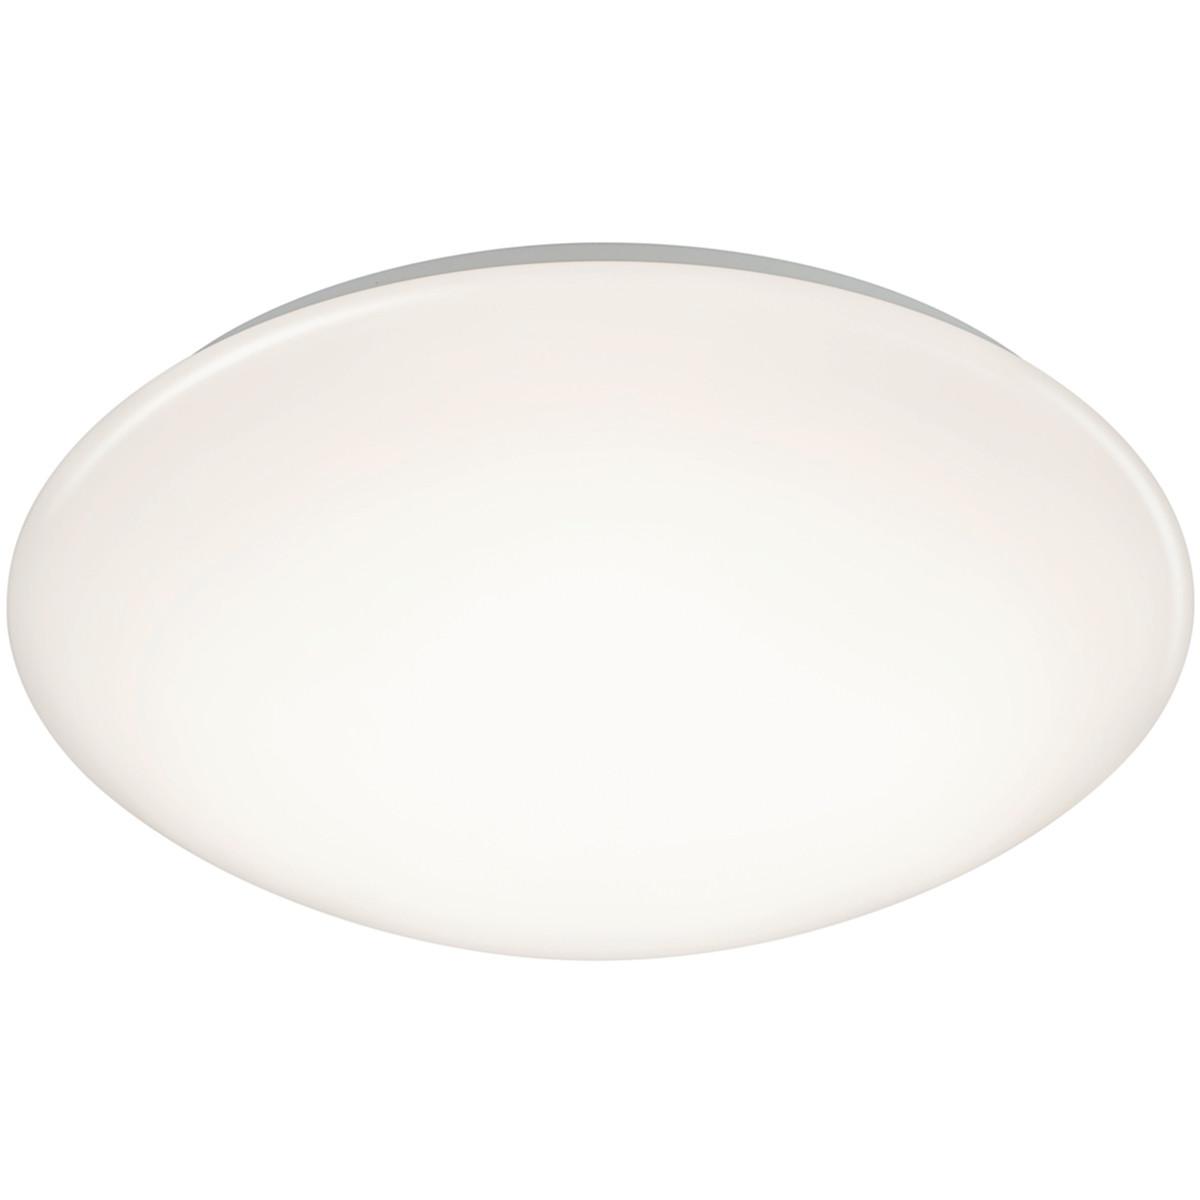 LED Plafondlamp - Trion Puta - Opbouw Rond 15W - Spatwaterdicht IP44 - Warm Wit 3000K - Mat Wit Kuns